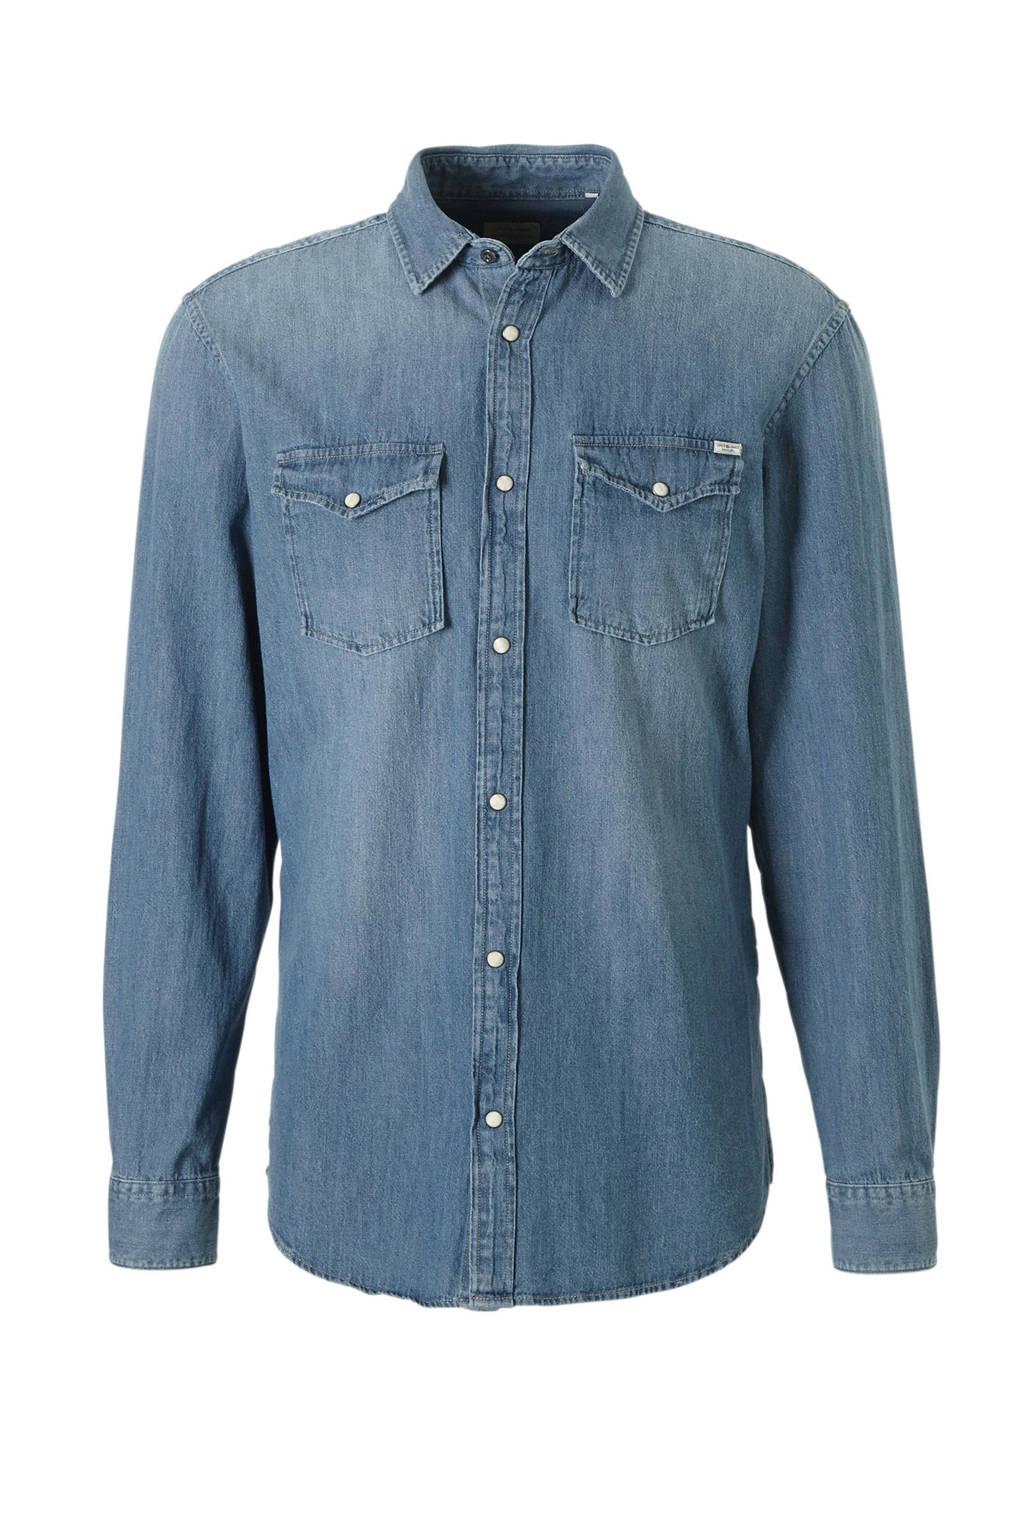 JACK & JONES ESSENTIALS Sheridan slim fit overhemd, Medium blue denim